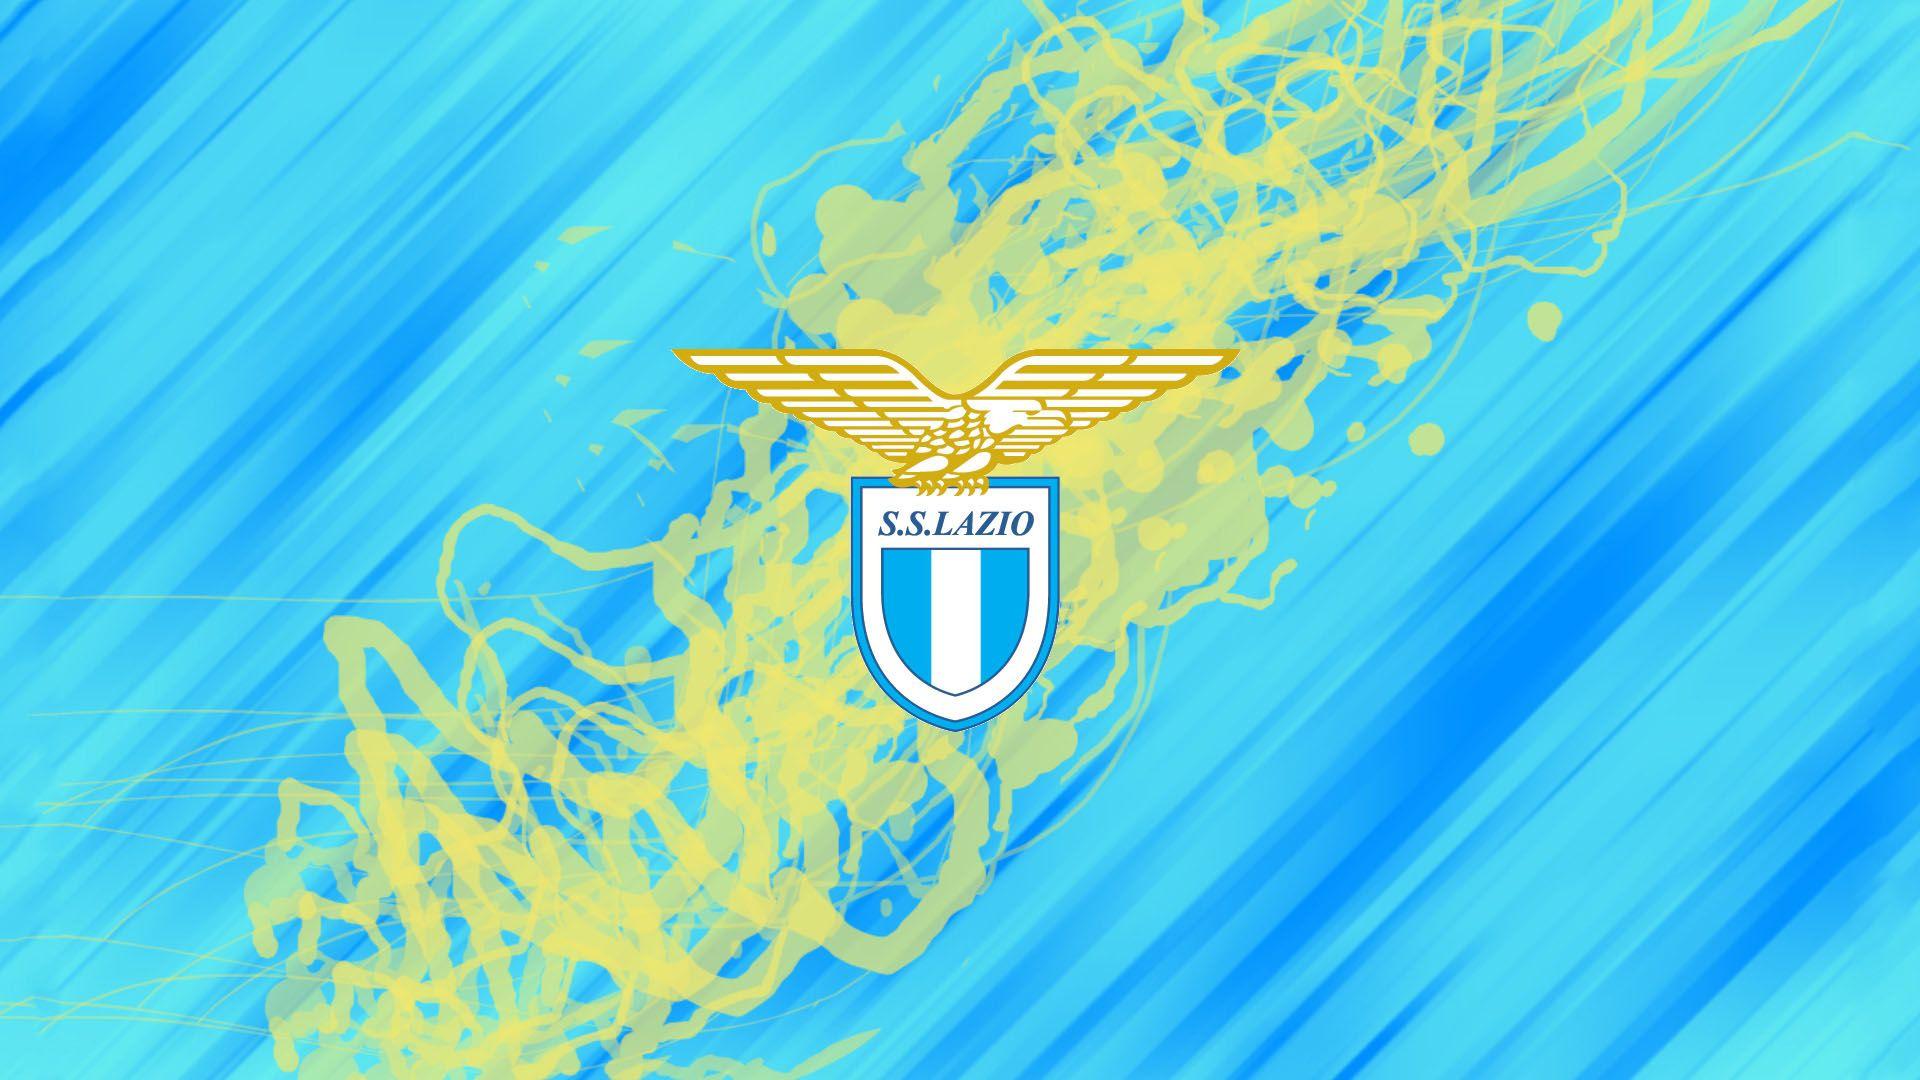 SS-Lazio-Wallpapers-HD - HDWallpaperSets.Com